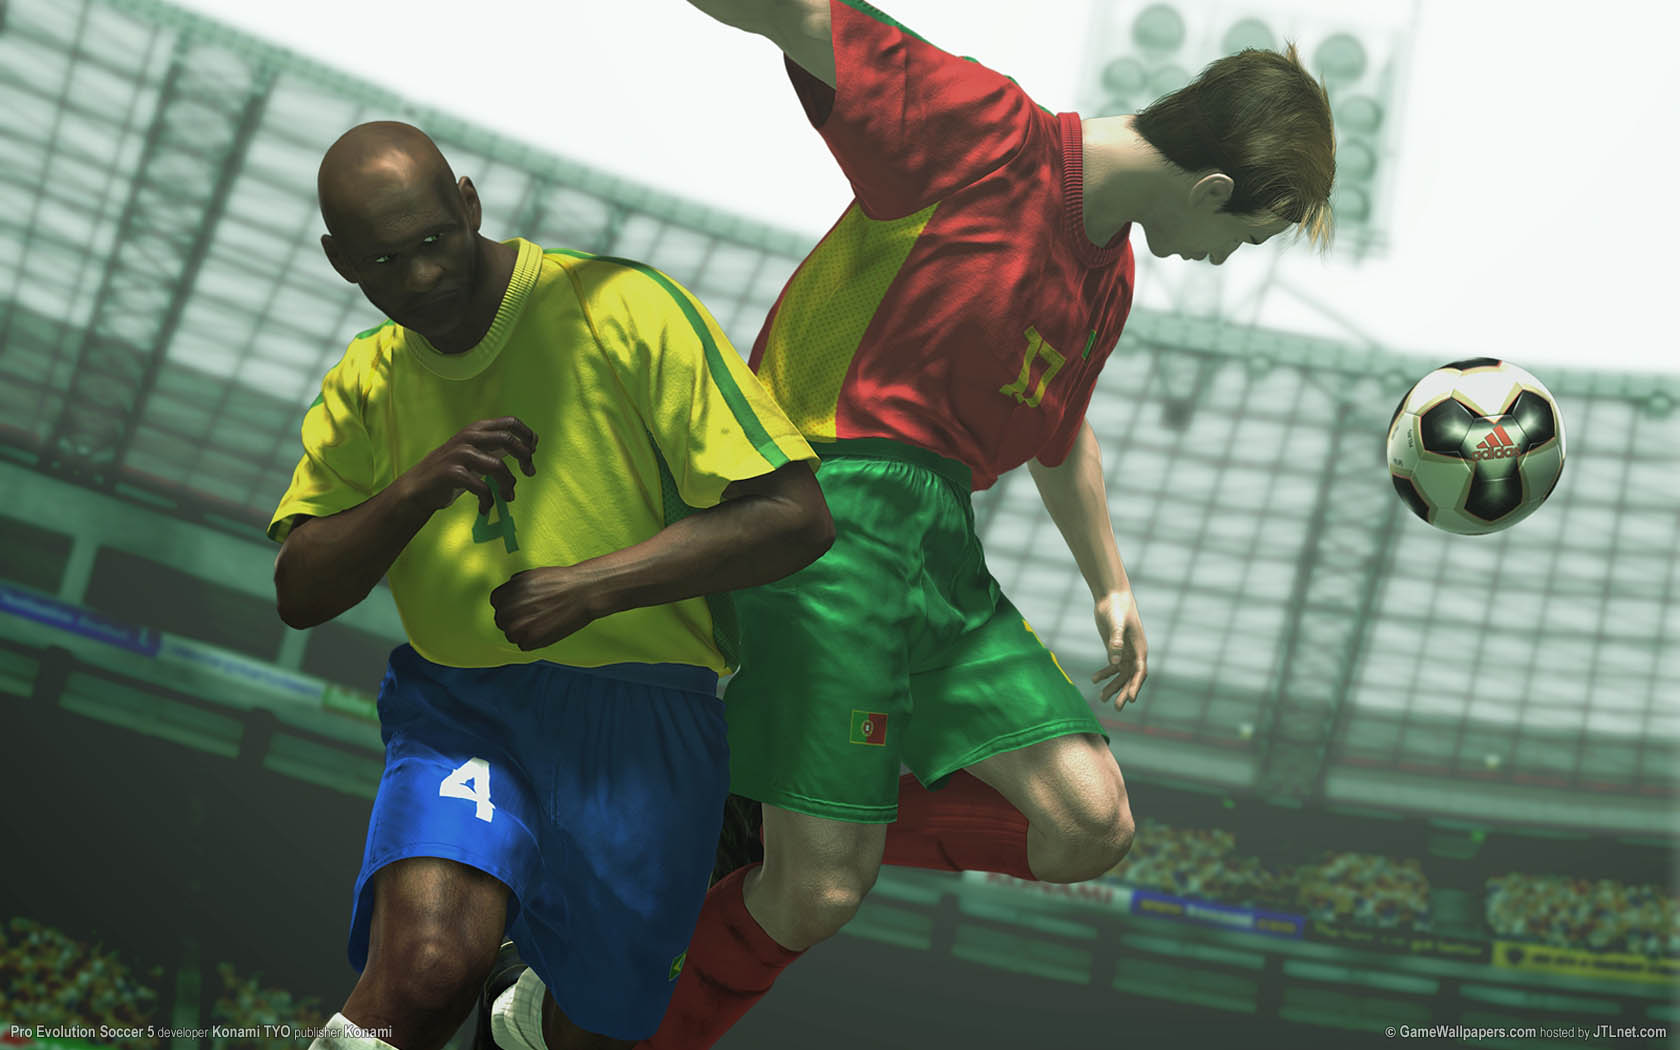 Pro Evolution Soccer 5 wallpaper 01 1680x1050